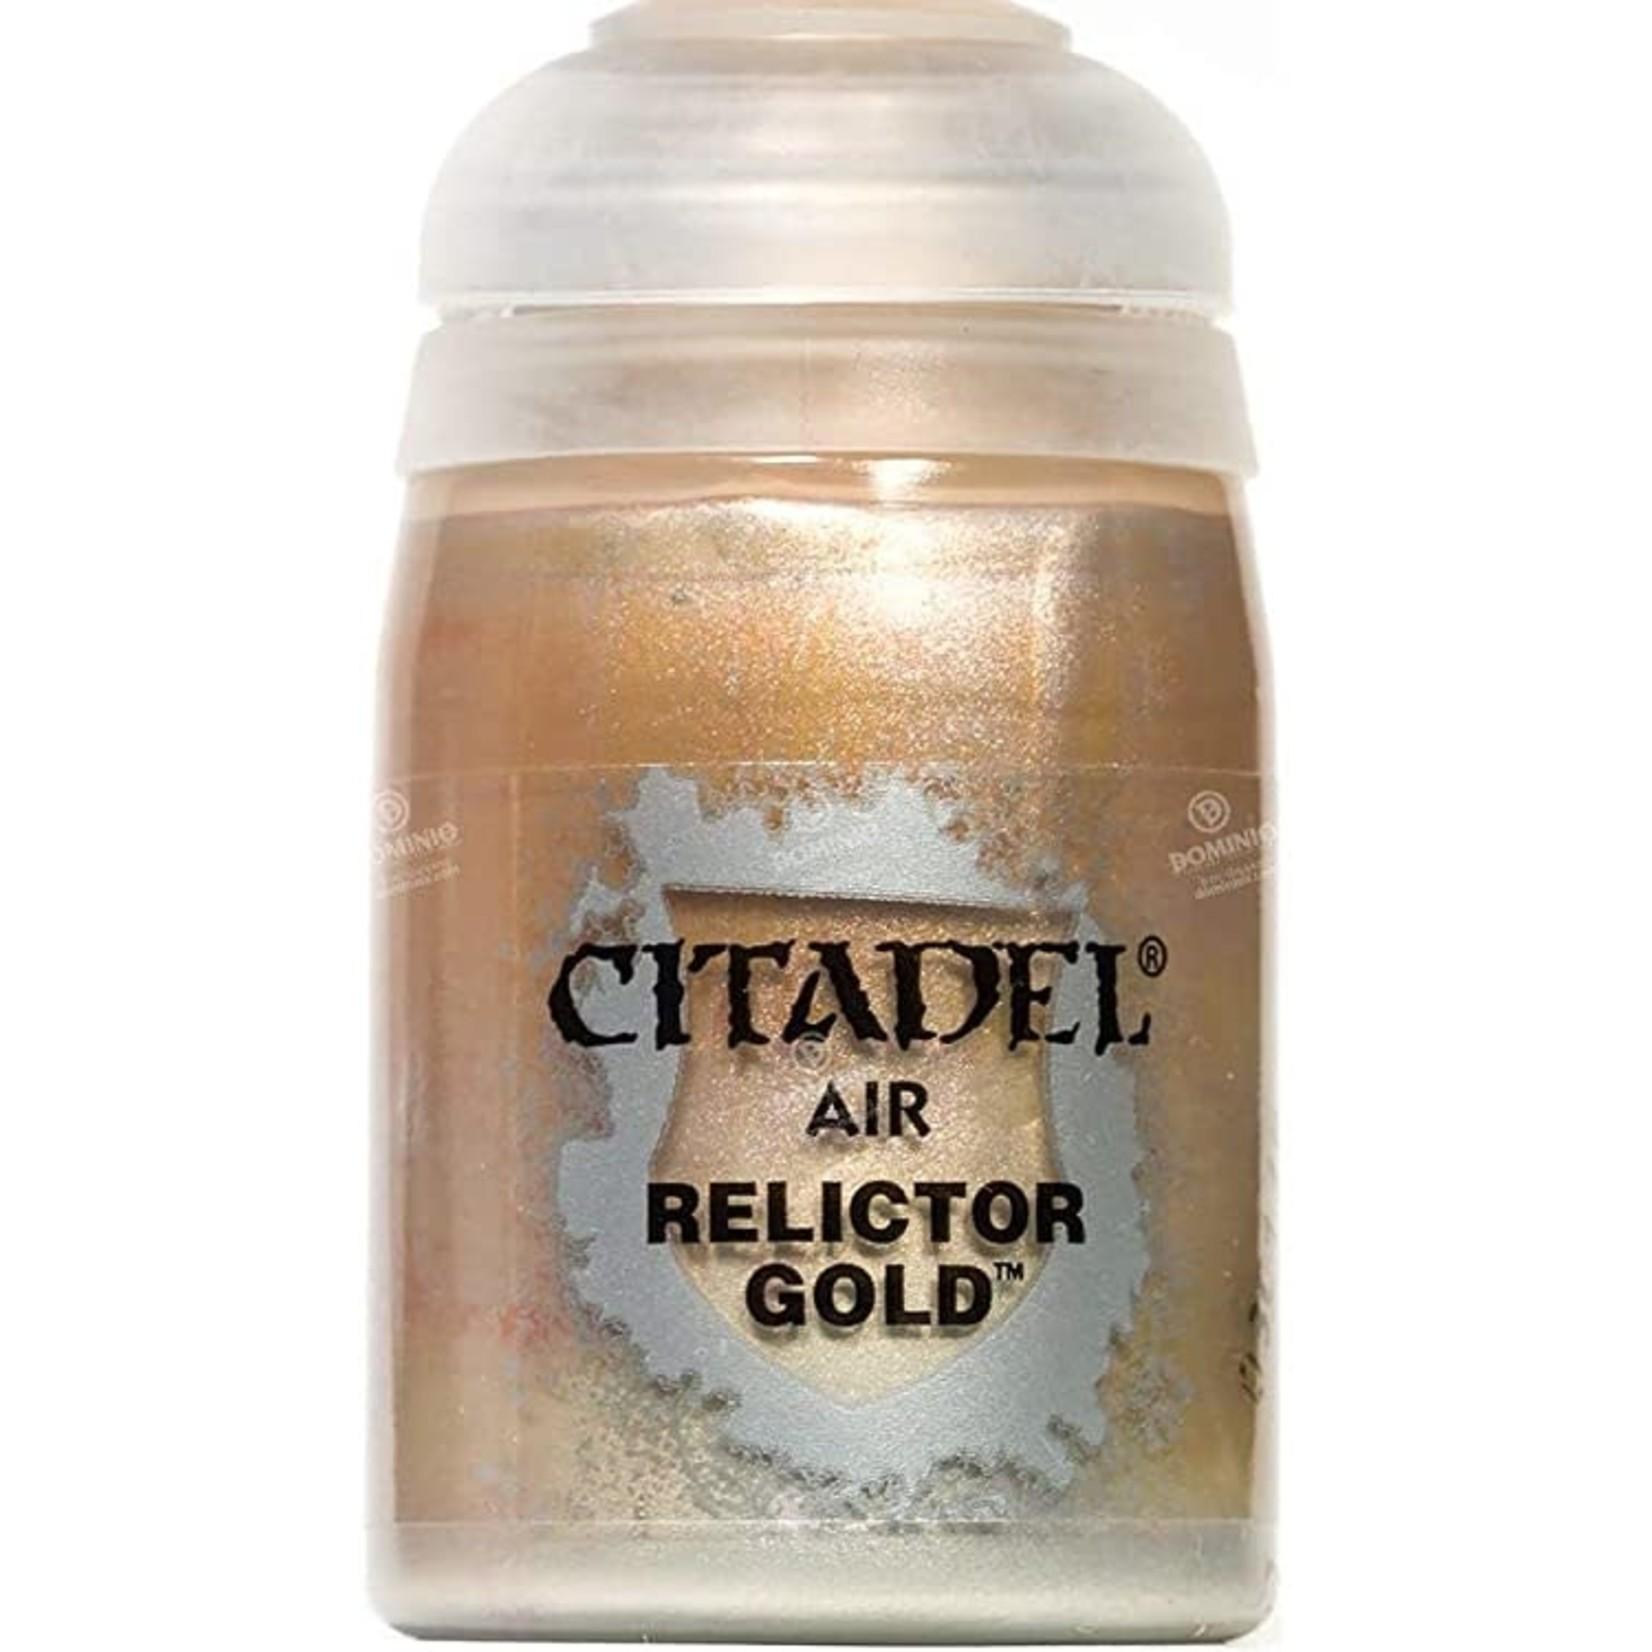 Games Workshop Citadel Paint: Relictor Gold Air (24 ml)